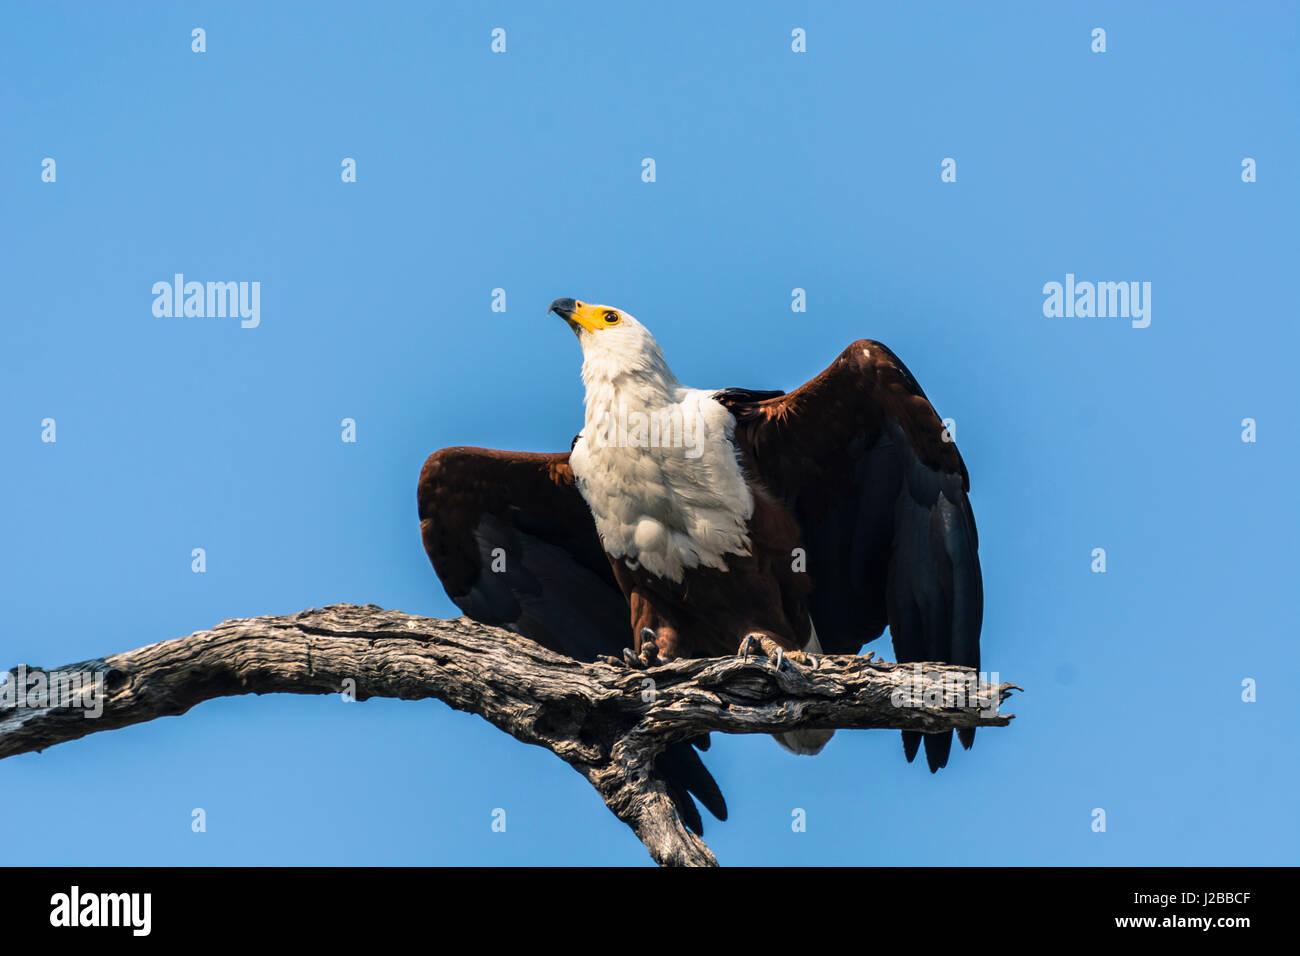 Botswana. Chobe National Park. African fish eagle (Haliaeetus vocifer) about to take flight. - Stock Image